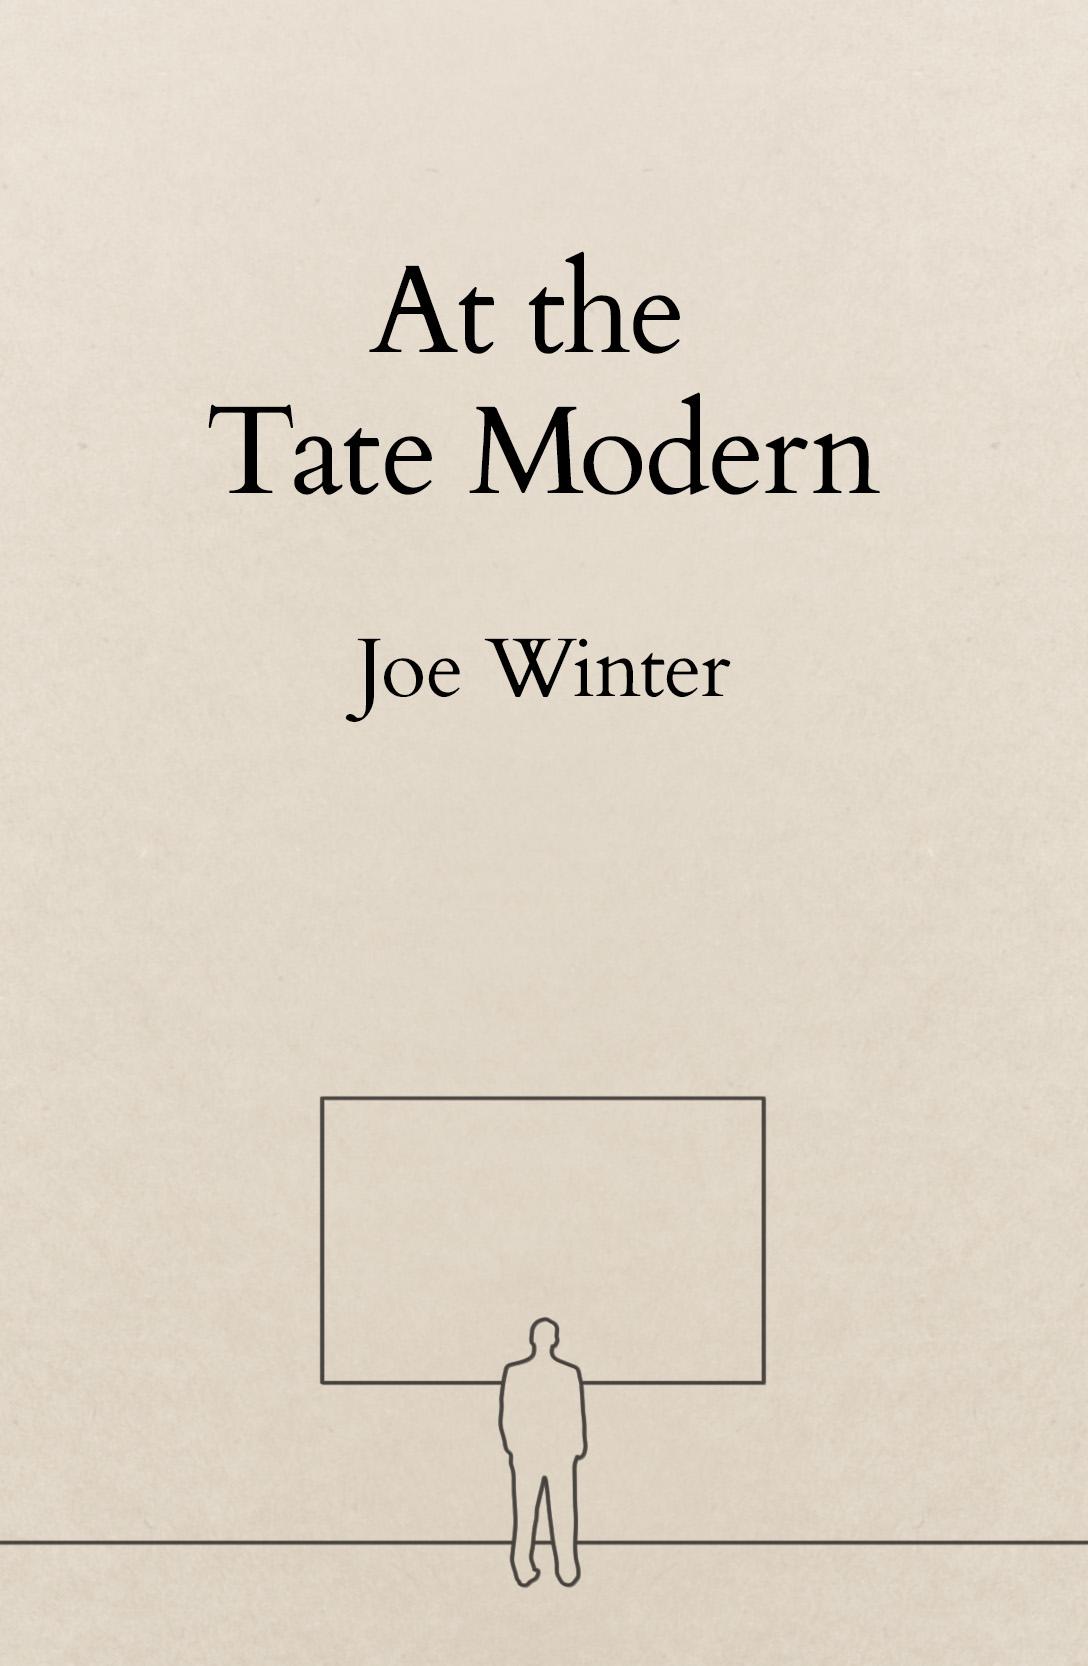 At the Tate Modern by Joe Winter